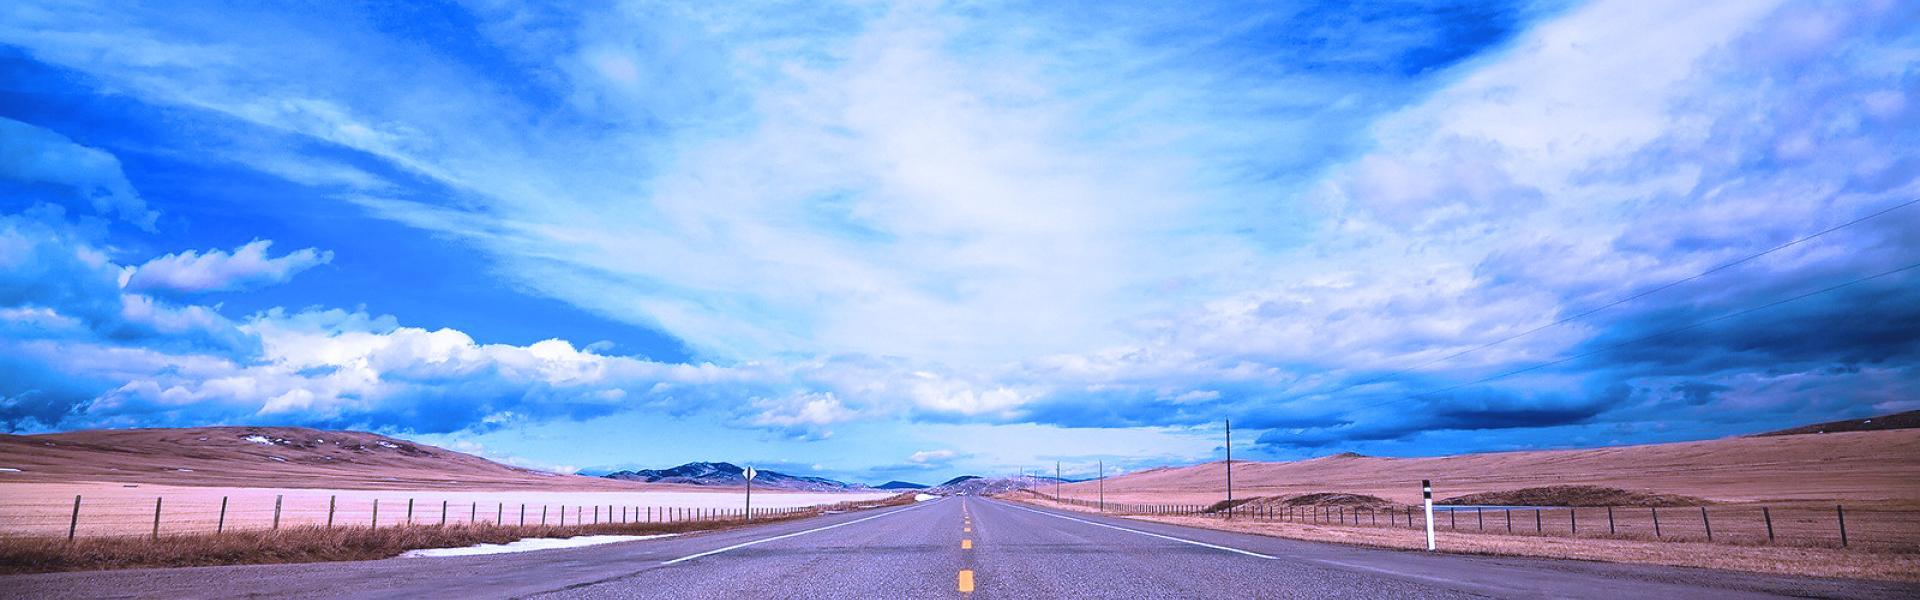 Blue road